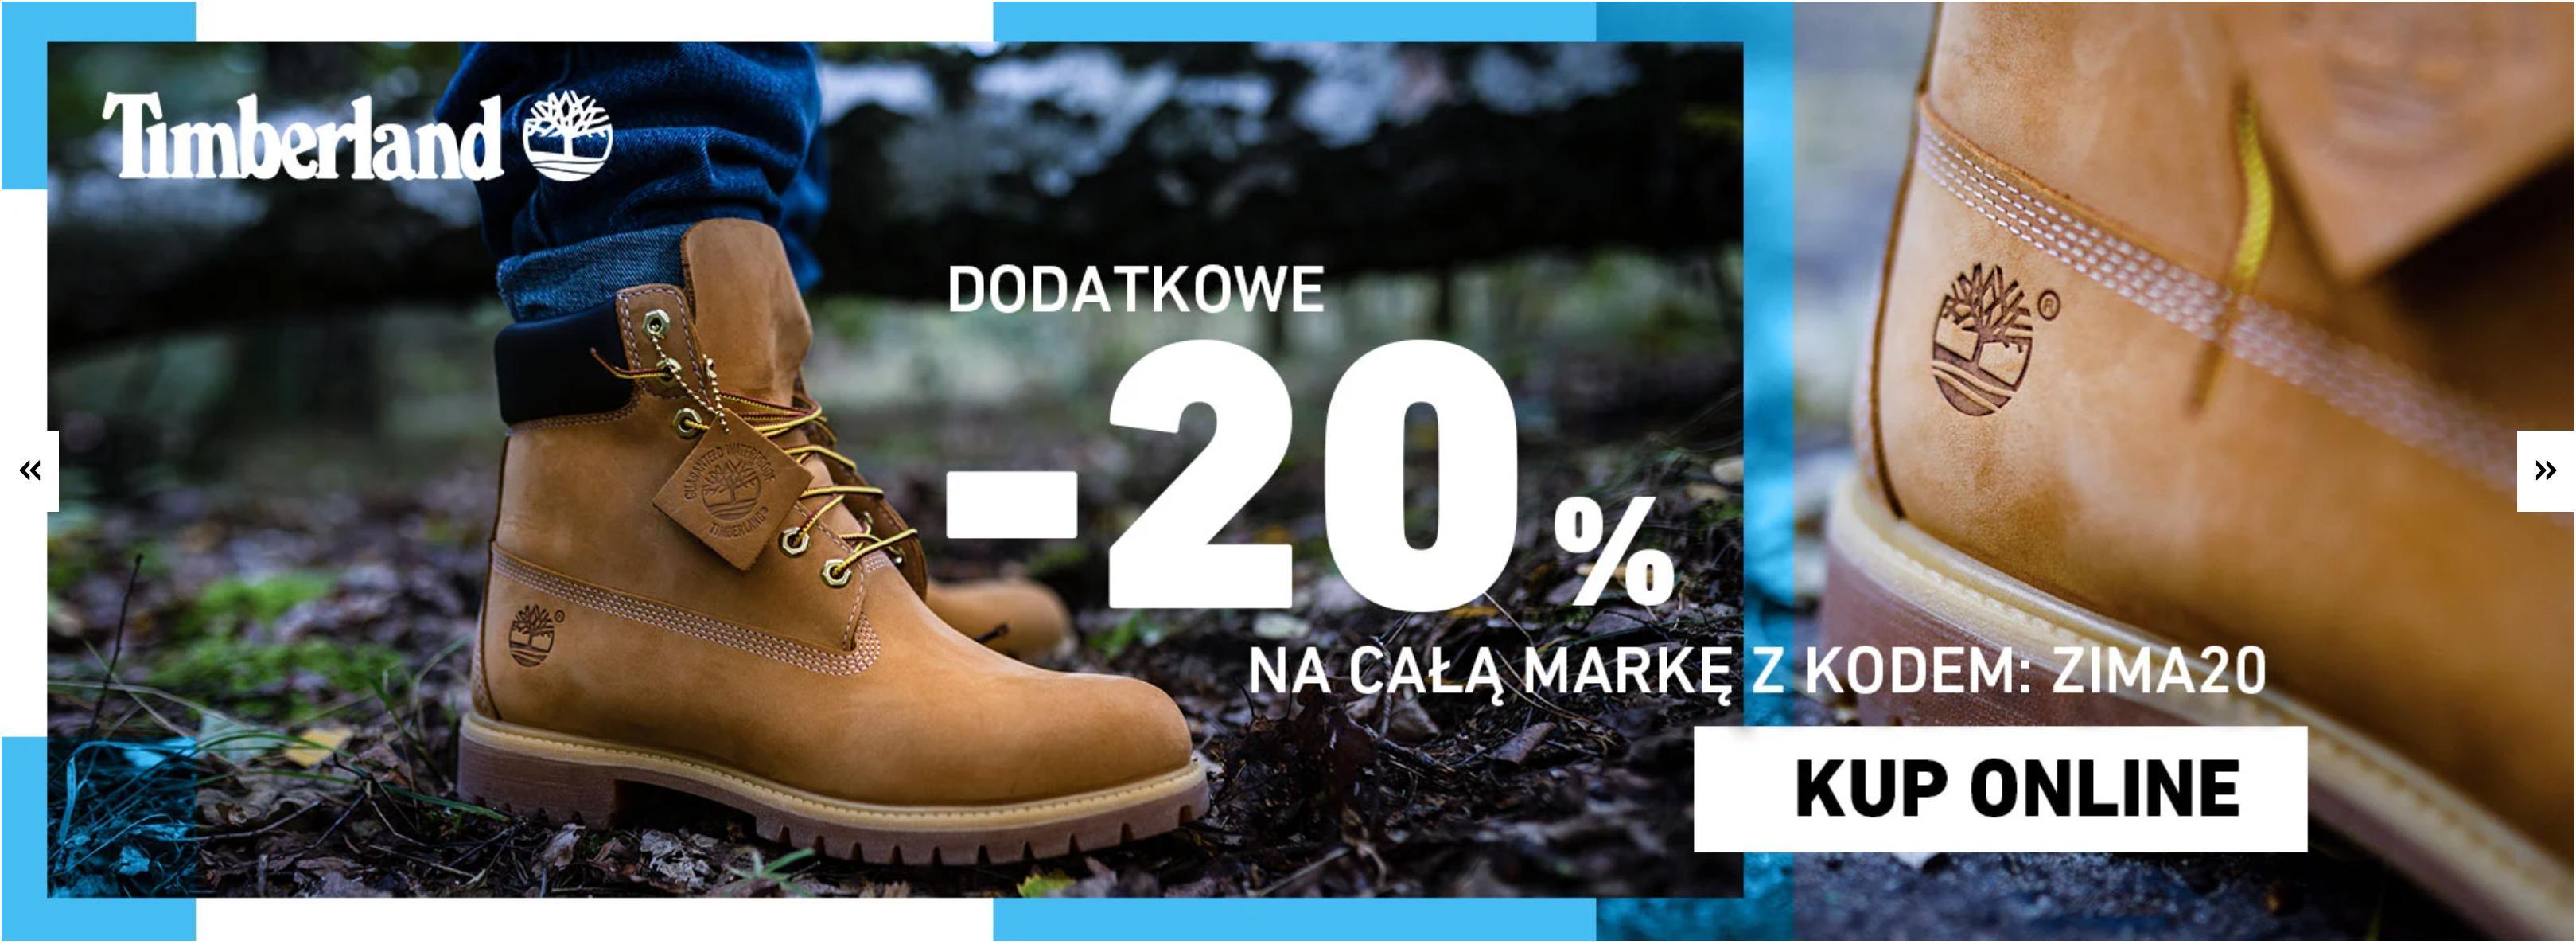 Eastend: dodatkowe 20% rabatu na buty marki Timberland